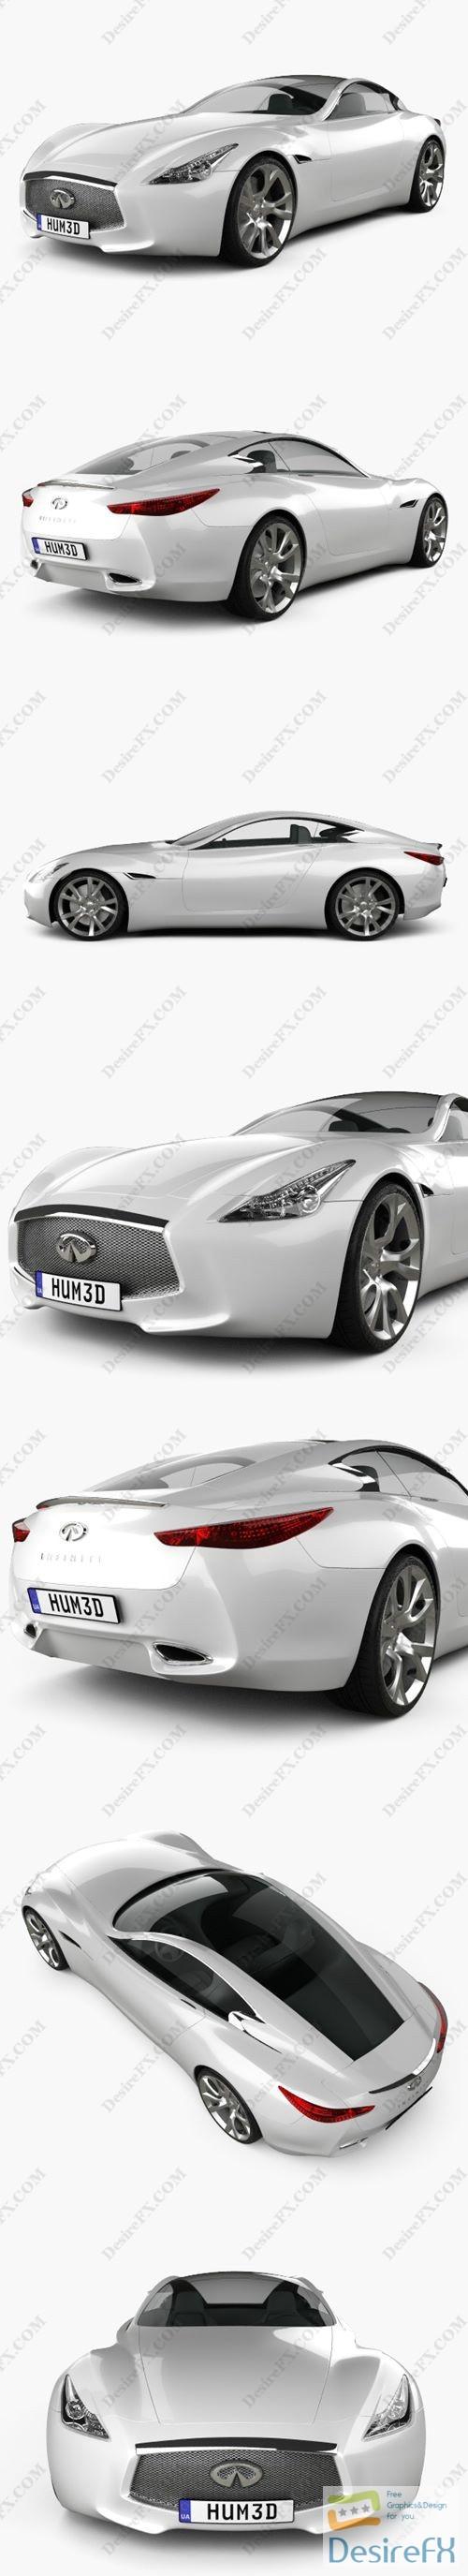 3d-models - Infiniti Essence 2011 3D Model